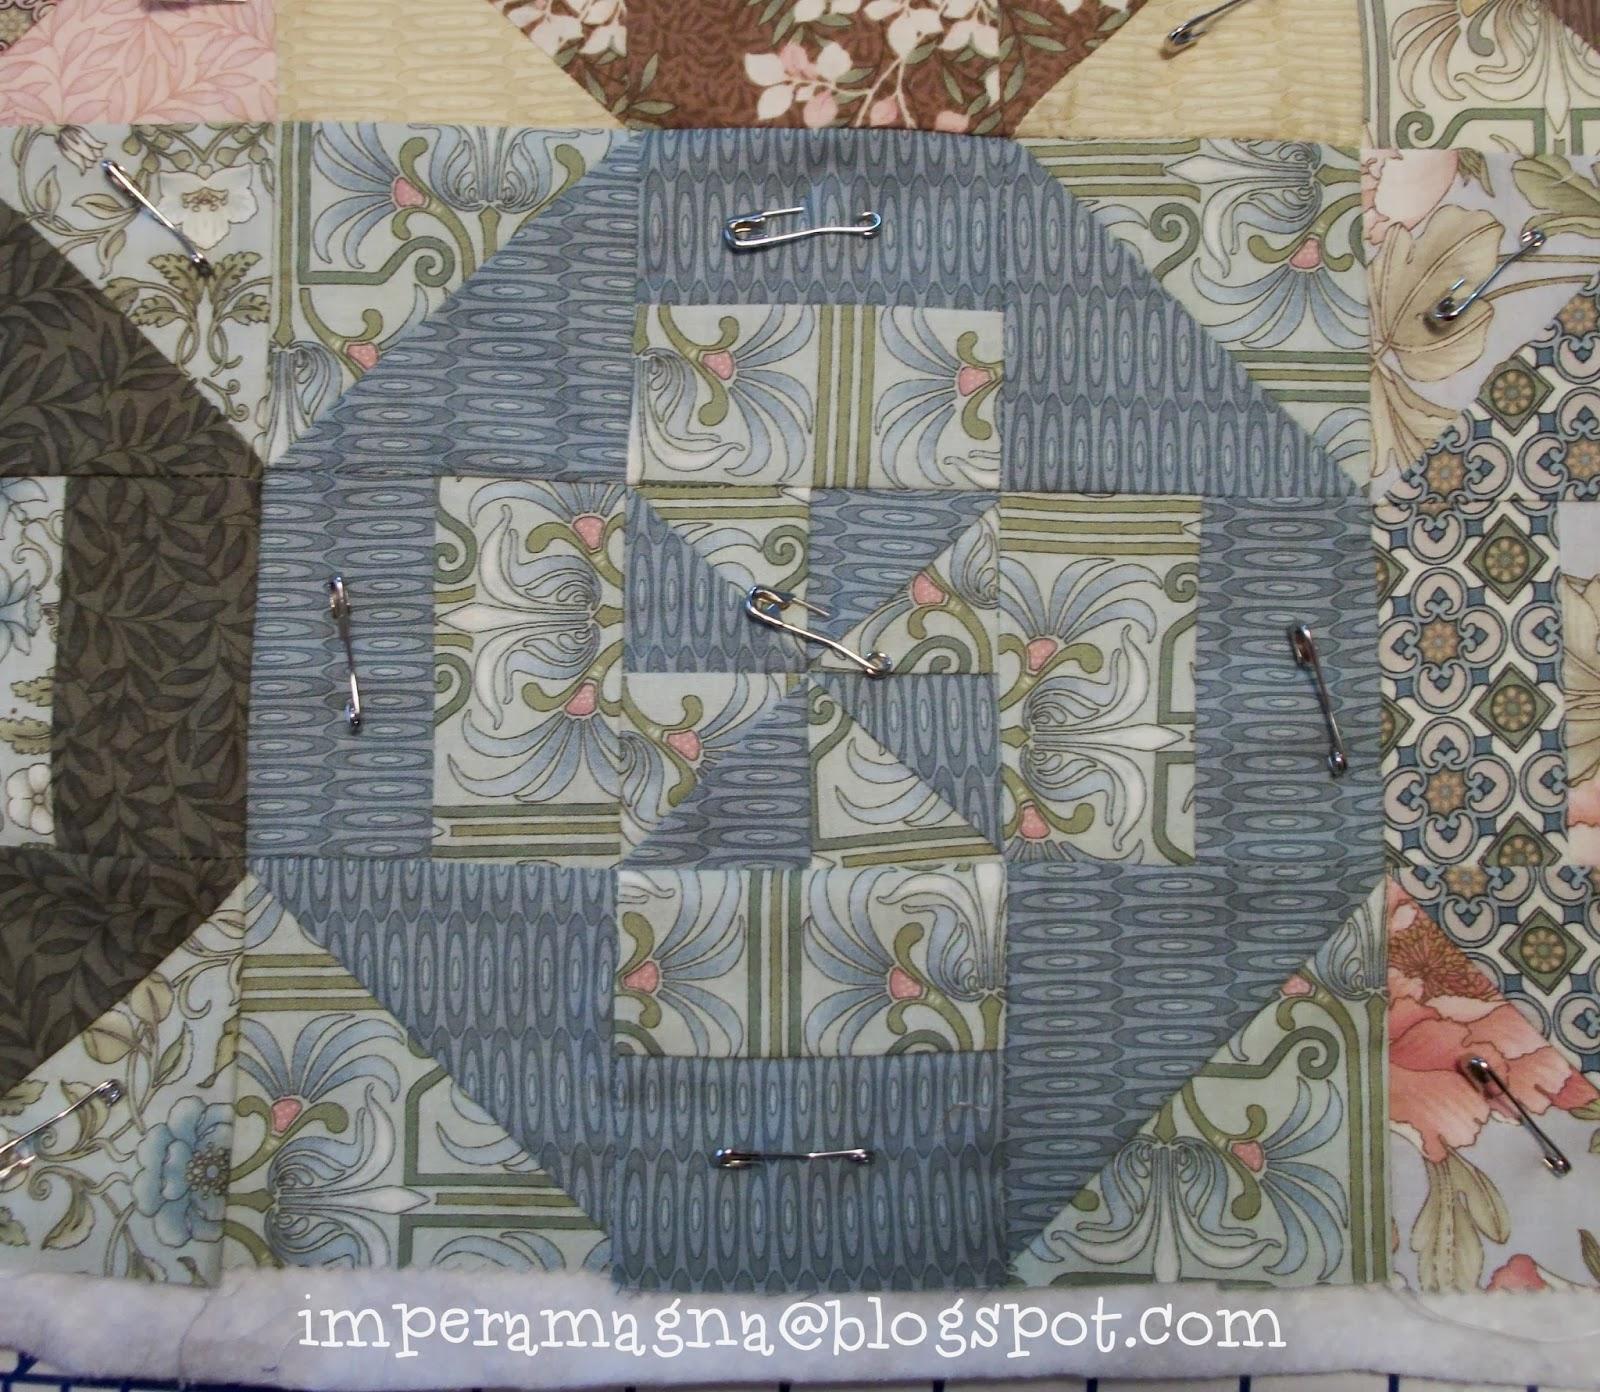 http://4.bp.blogspot.com/-eVcR3naiQ_E/Uu2CR_kQmLI/AAAAAAAAJgM/bh5xiyoiteE/s1600/new+runner+pinned+block.jpg